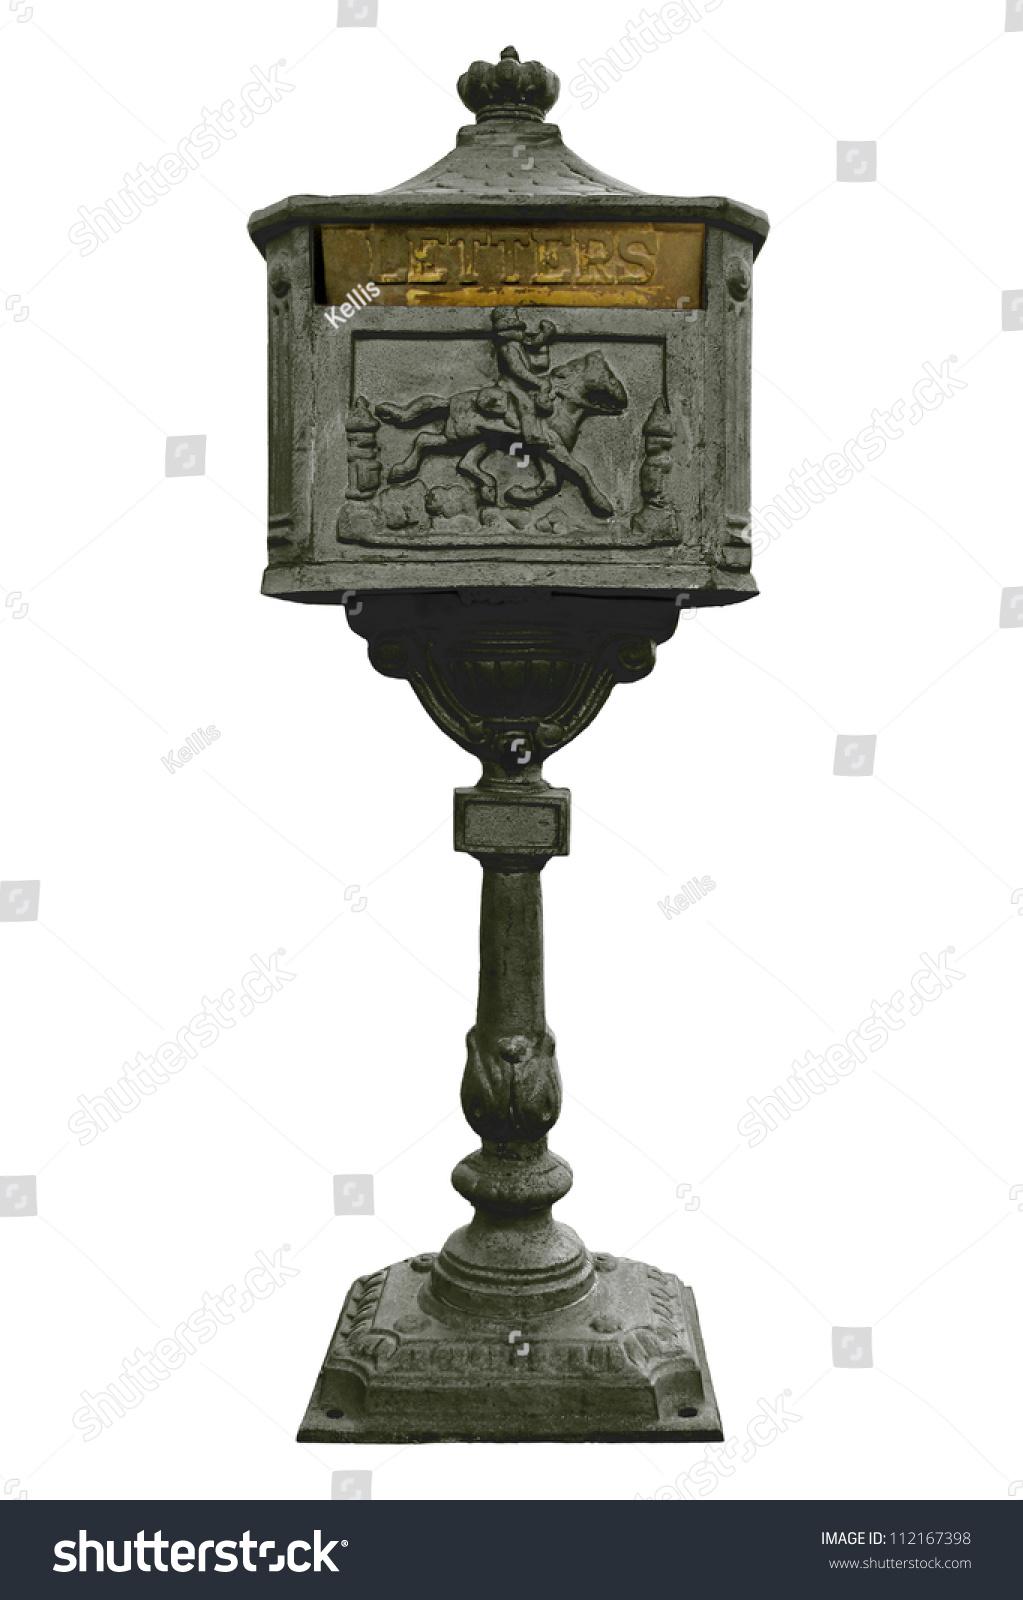 Vintage Cast Iron Mail Box Black Stock Photo 112167398